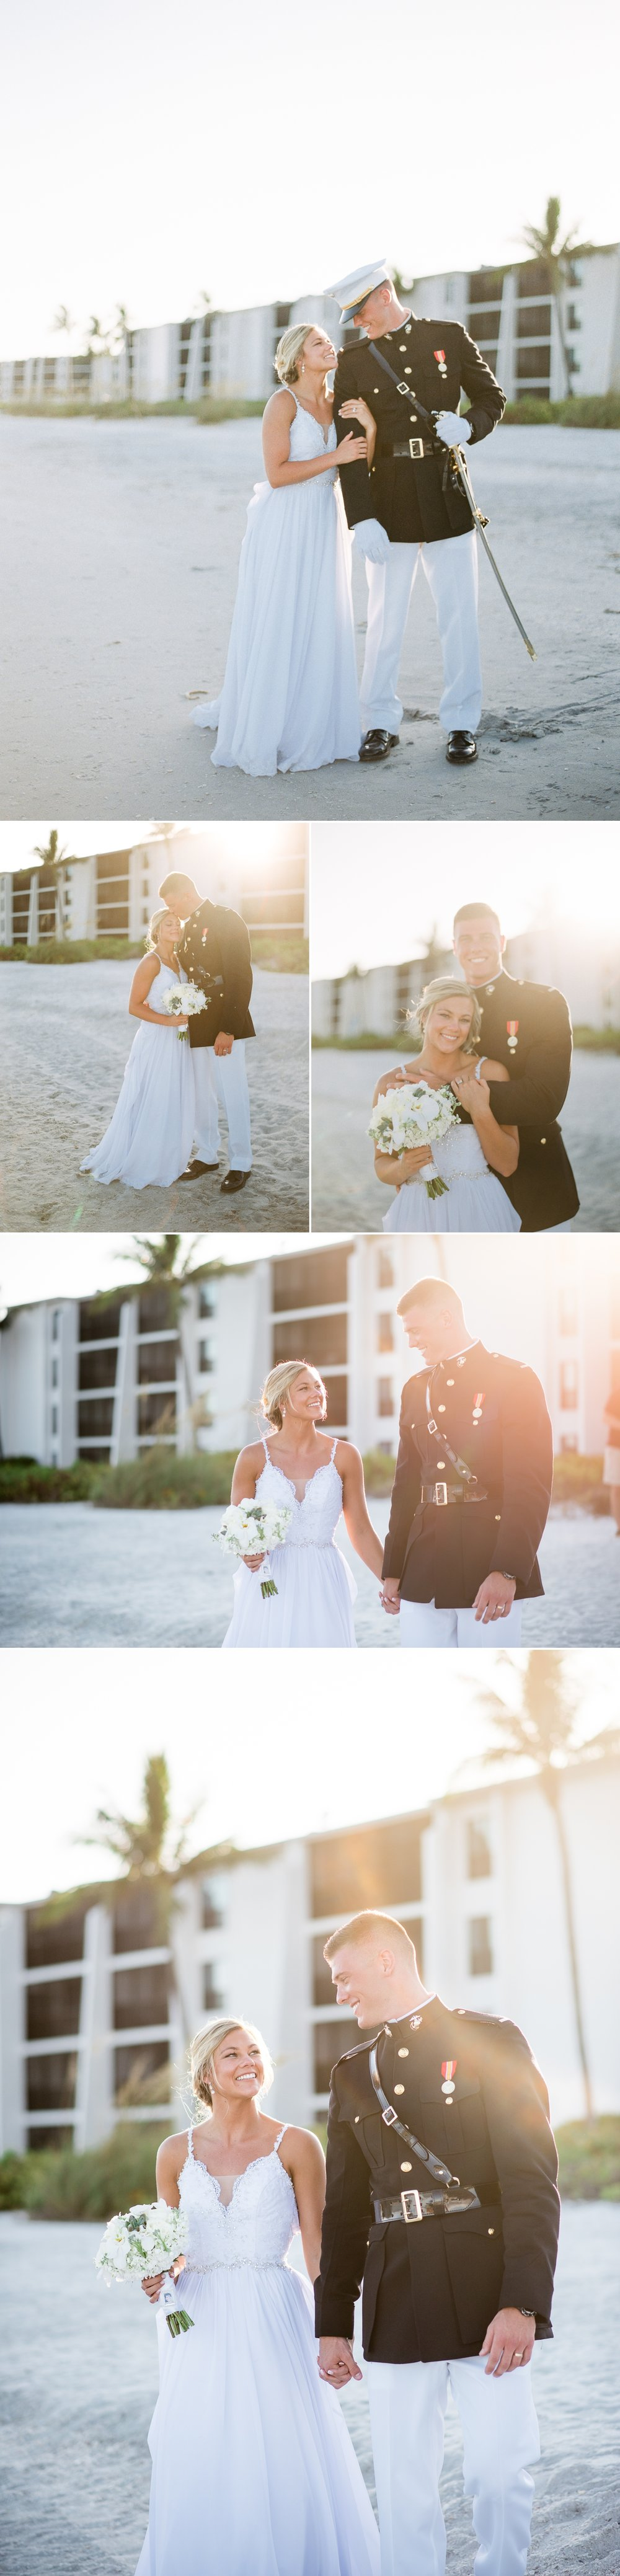 Alexa and Jordan Wed Blog 19.jpg